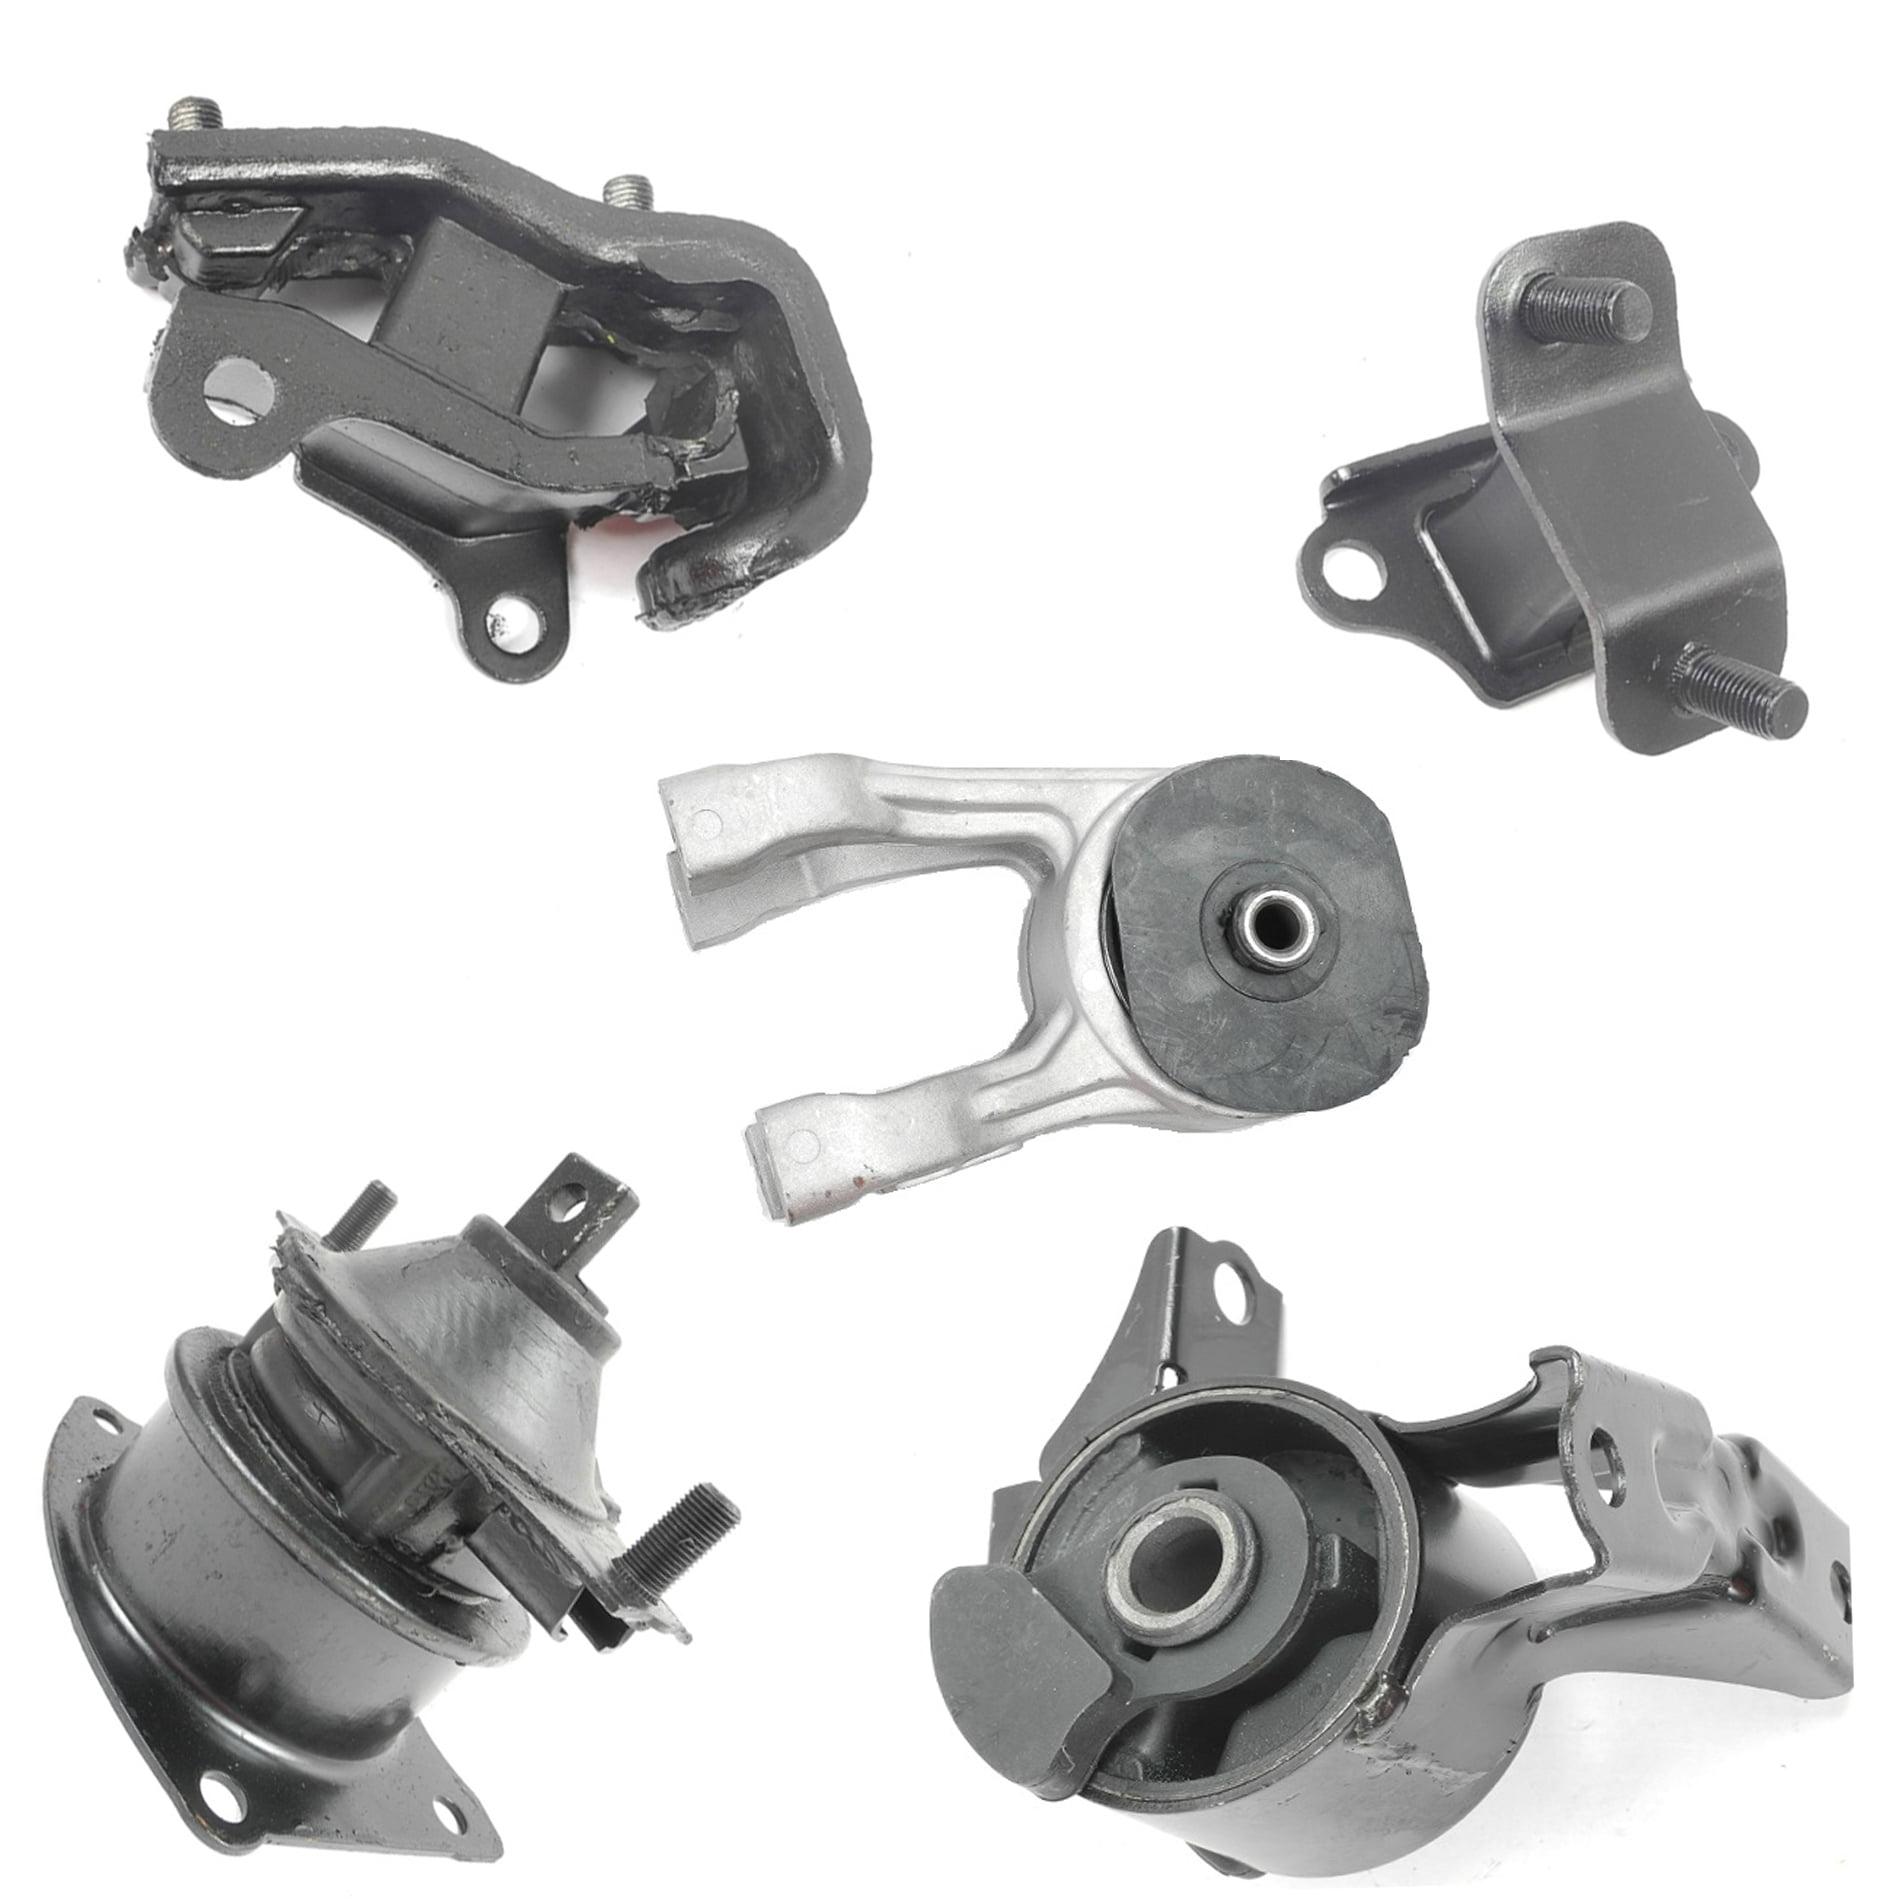 LX VTEC Engine Motor /& Trans Mount M277 For 05-06 Honda Odyssey 3.5L EX